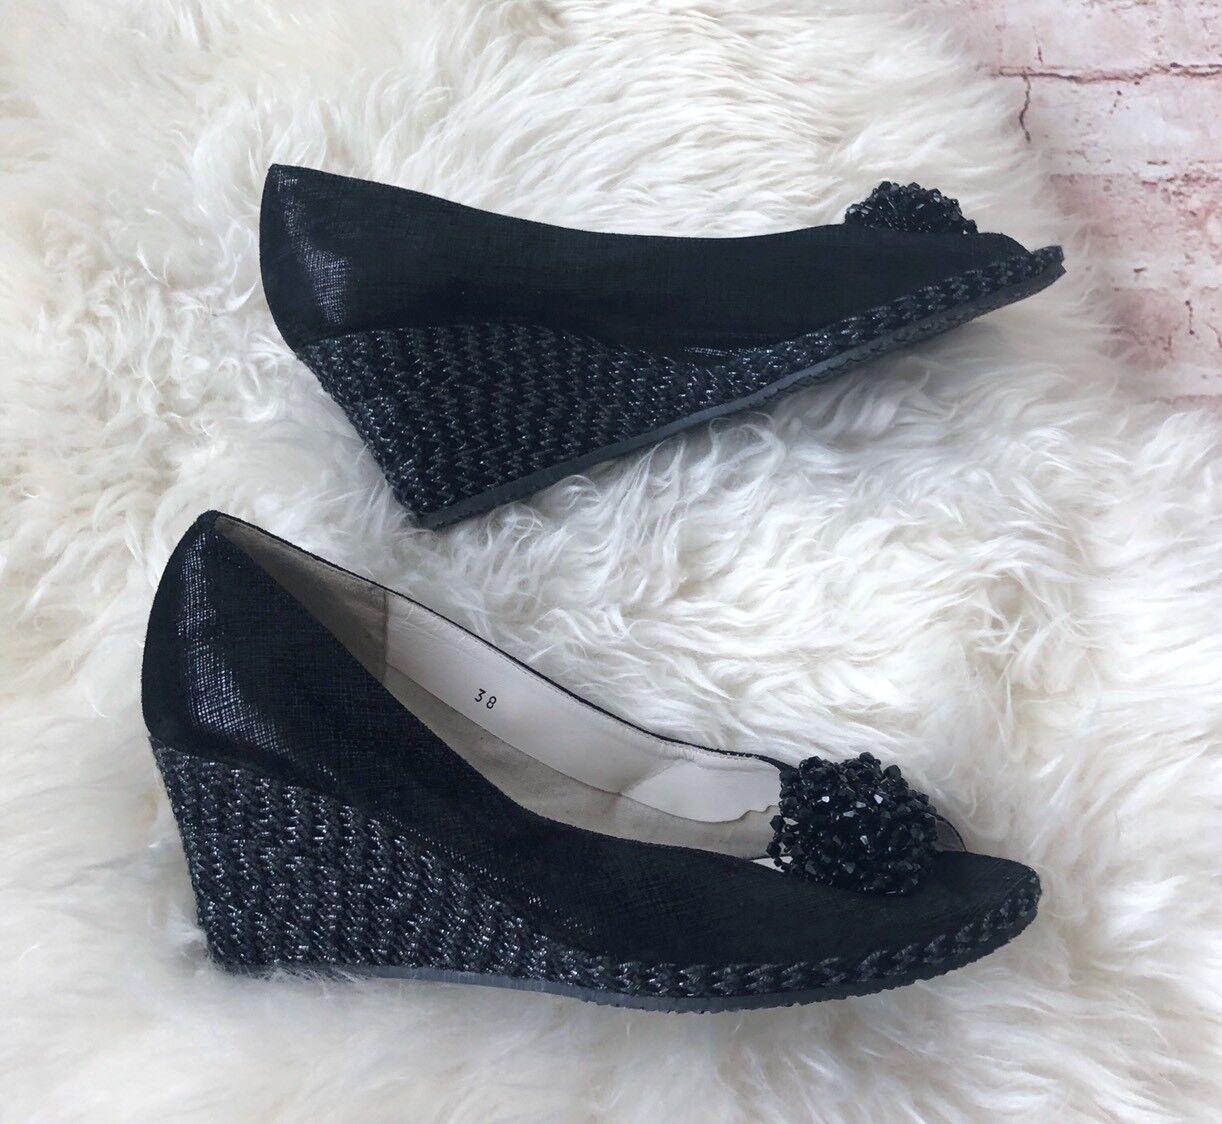 in vendita Gasuccio&Scalera Eu 38 8 Donna  scarpe Peep Peep Peep Toe nero Leather Textile Platform  garantito